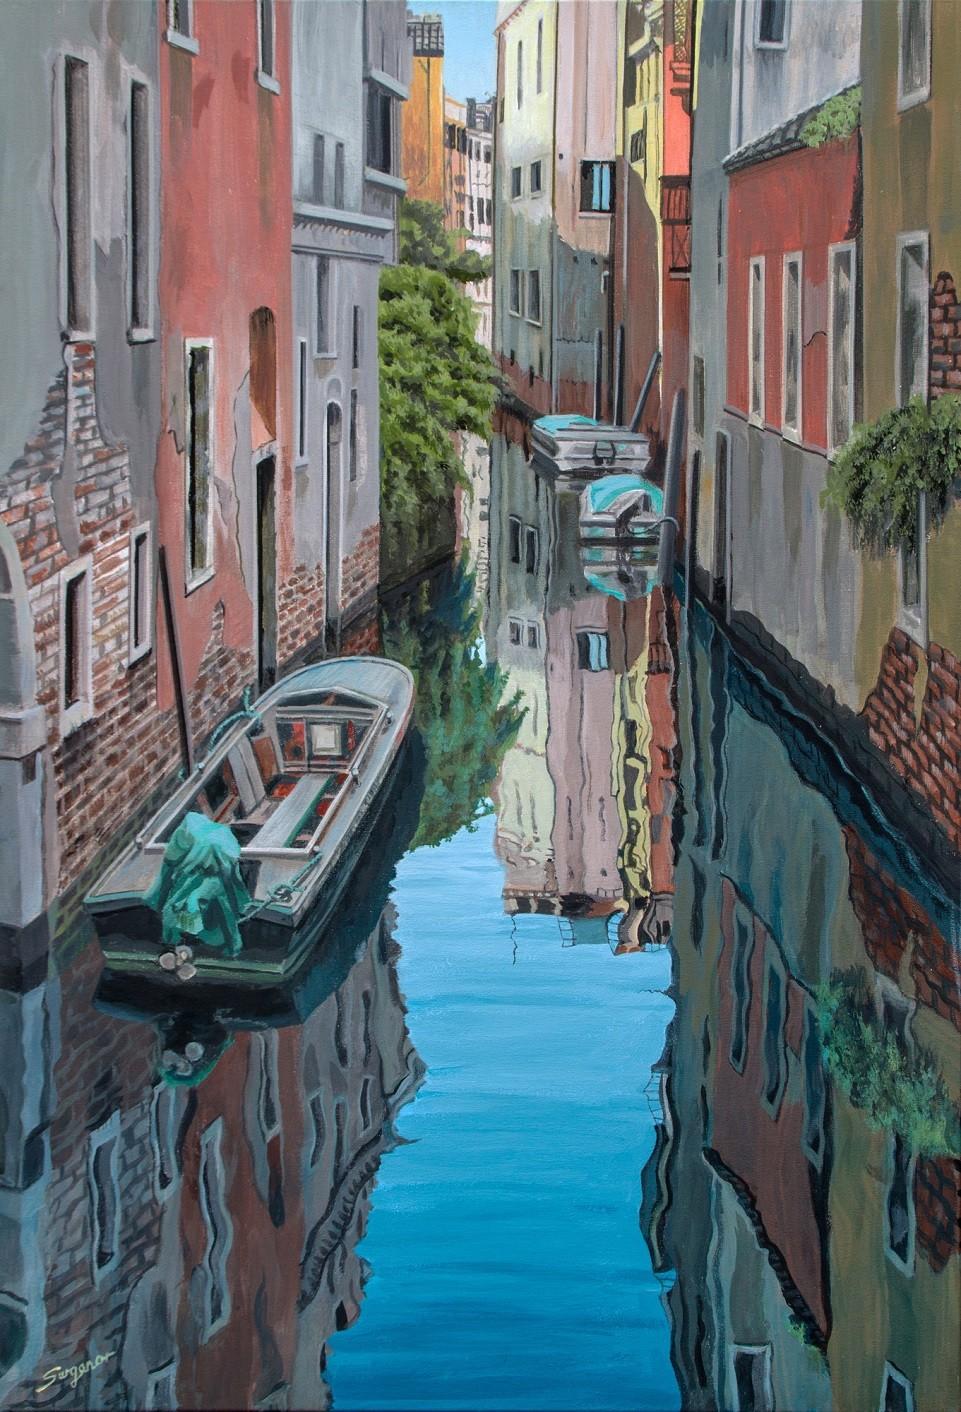 Morning reflections, Venice